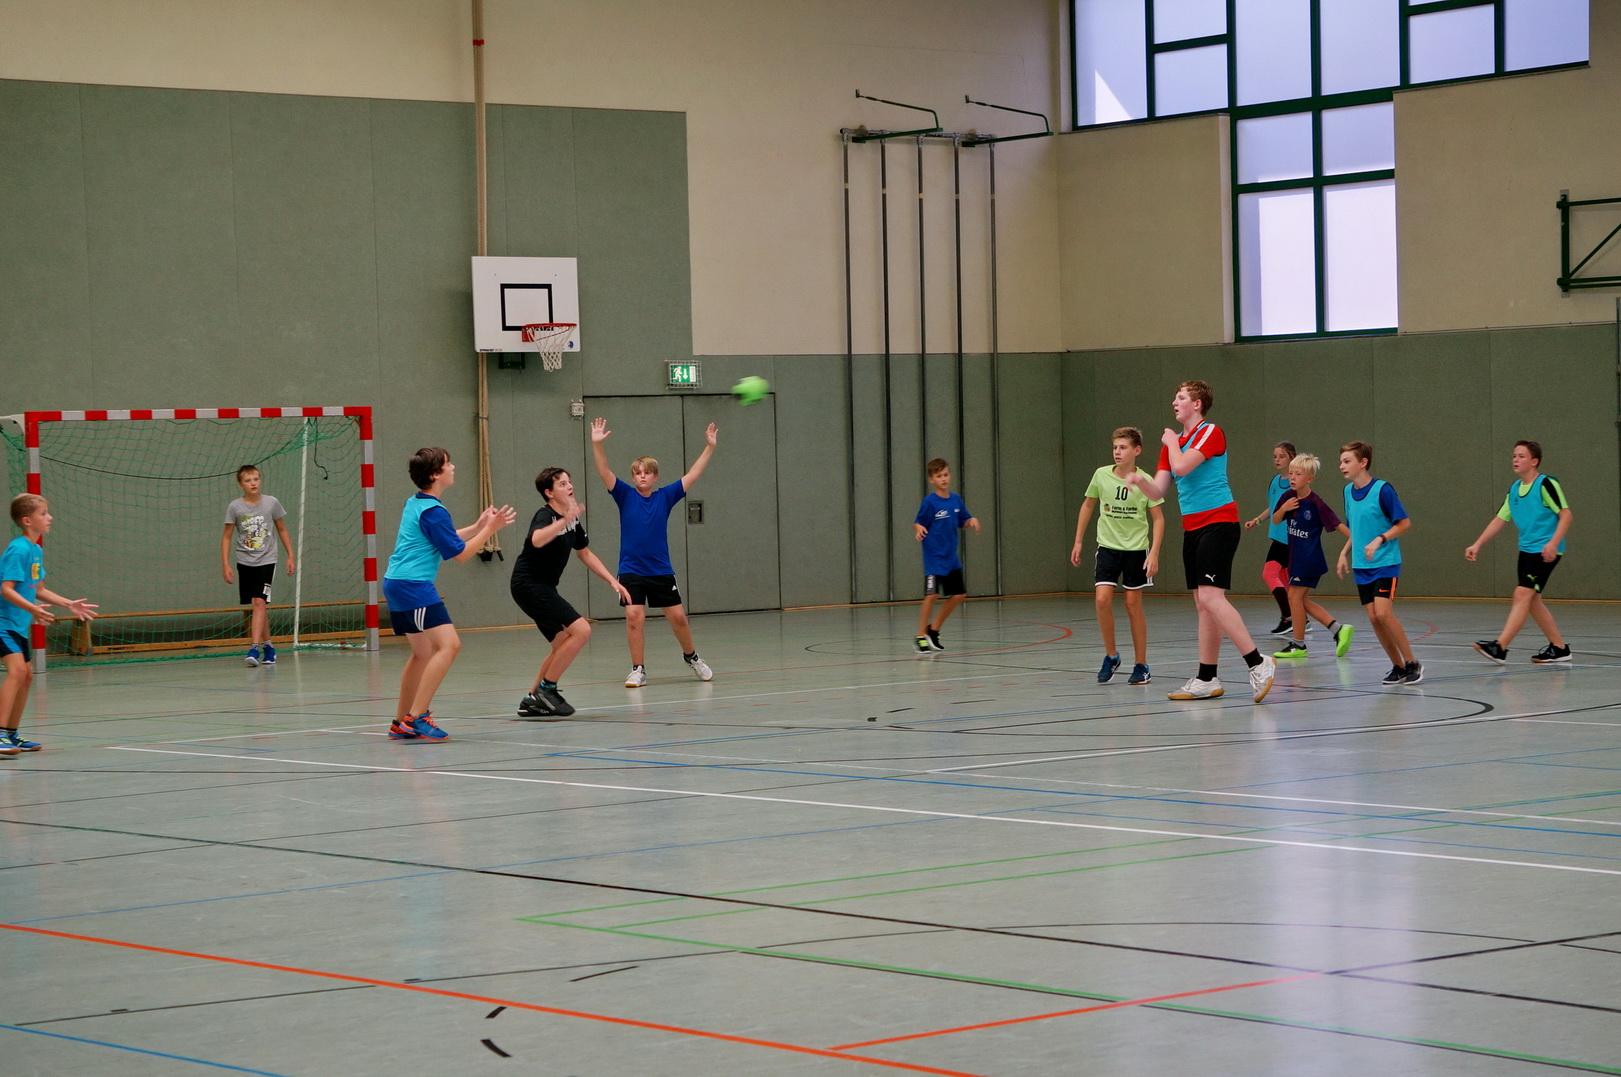 201808_Handballcamp_SDH_MG_107w